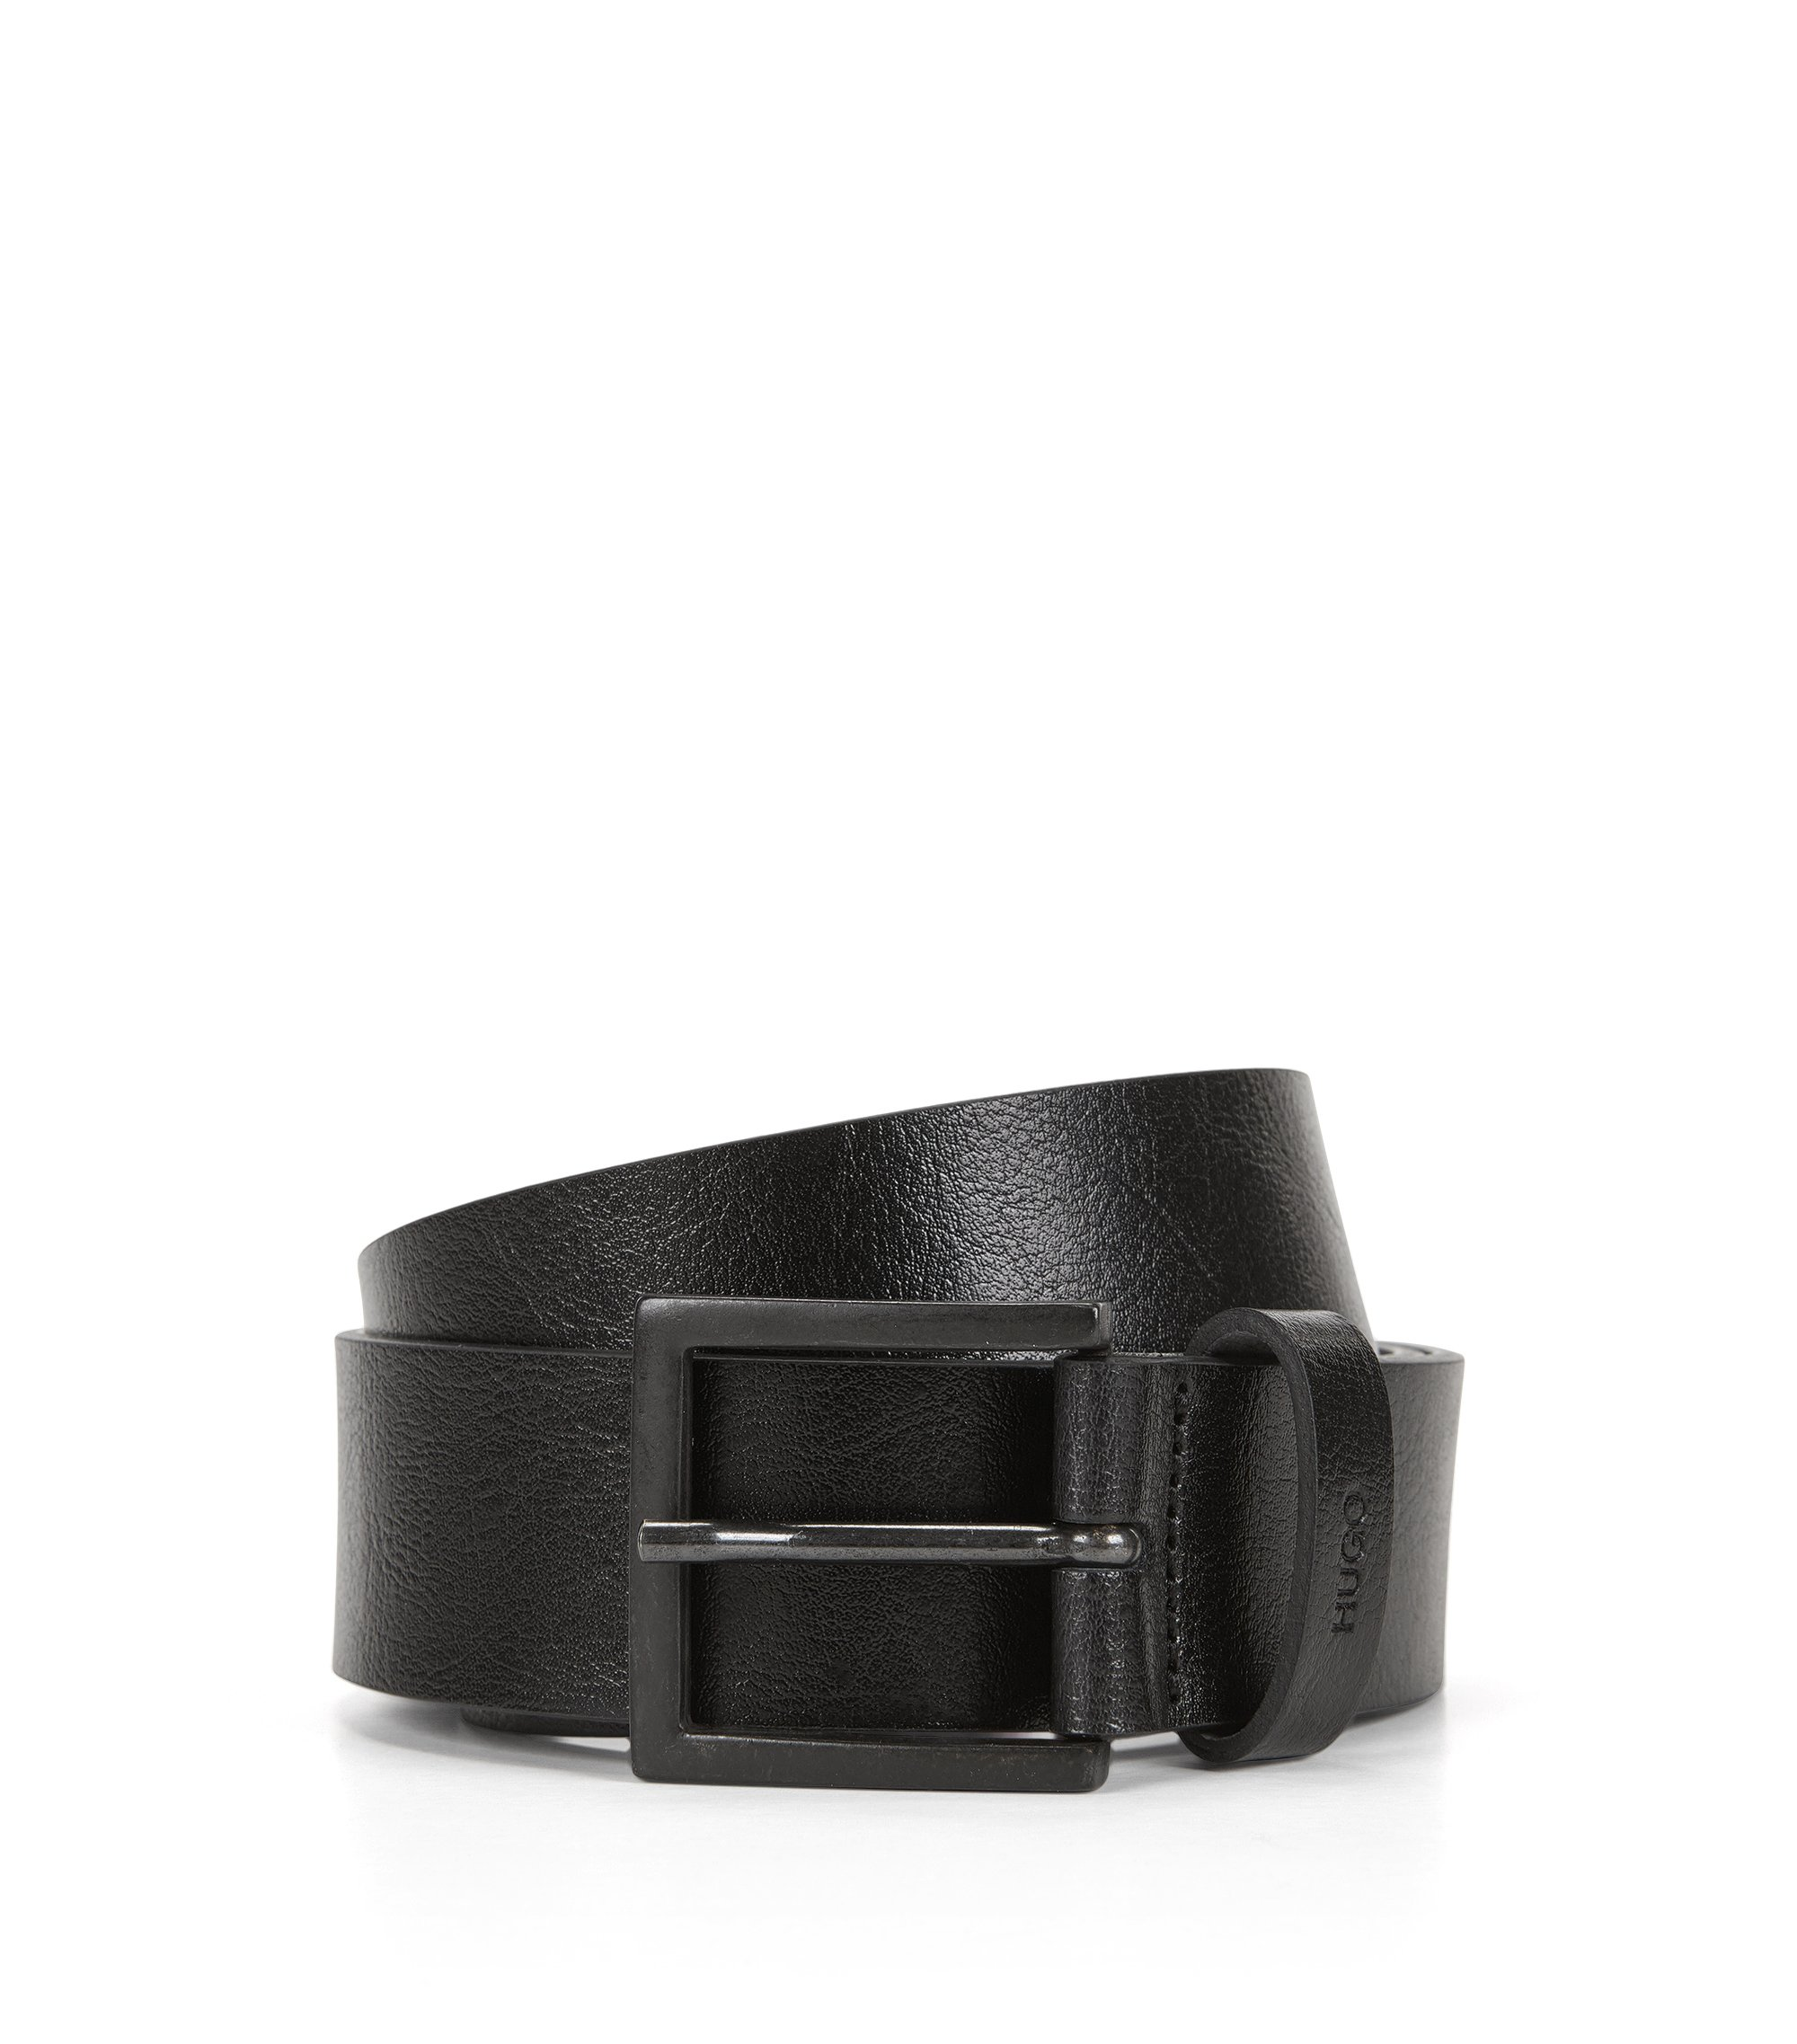 Leather Belt | Gotary Sz Ltpl, Black